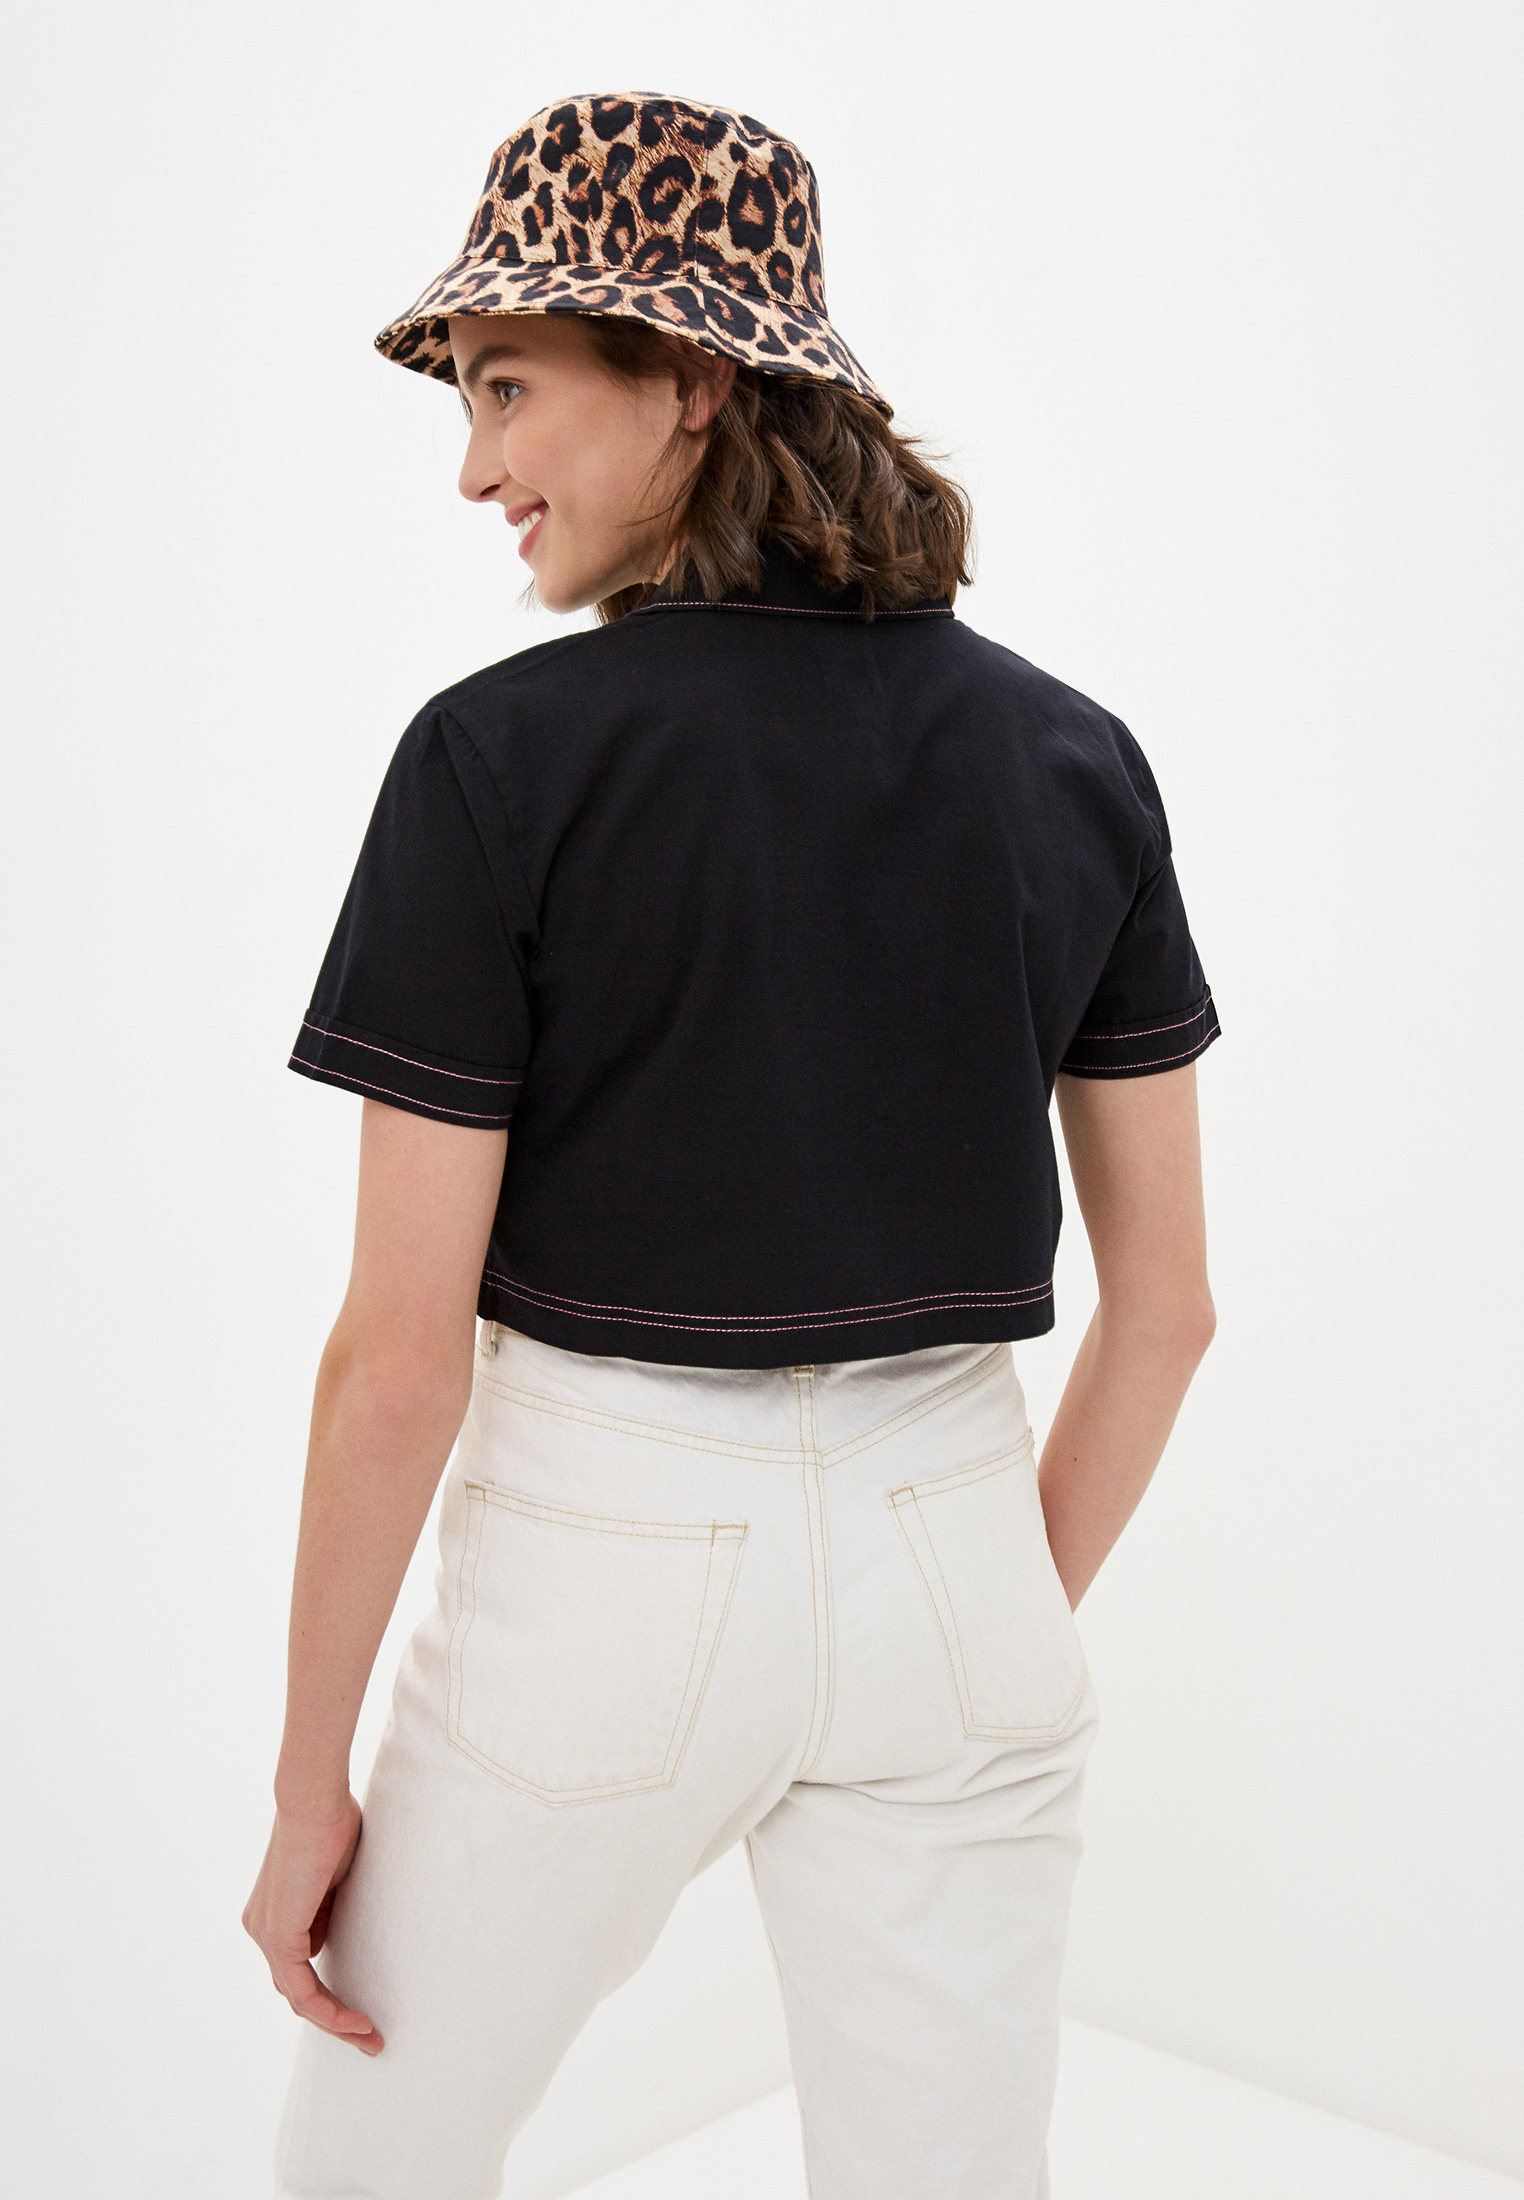 Рубашка с коротким рукавом VANS VA4MVGBLK: изображение 3